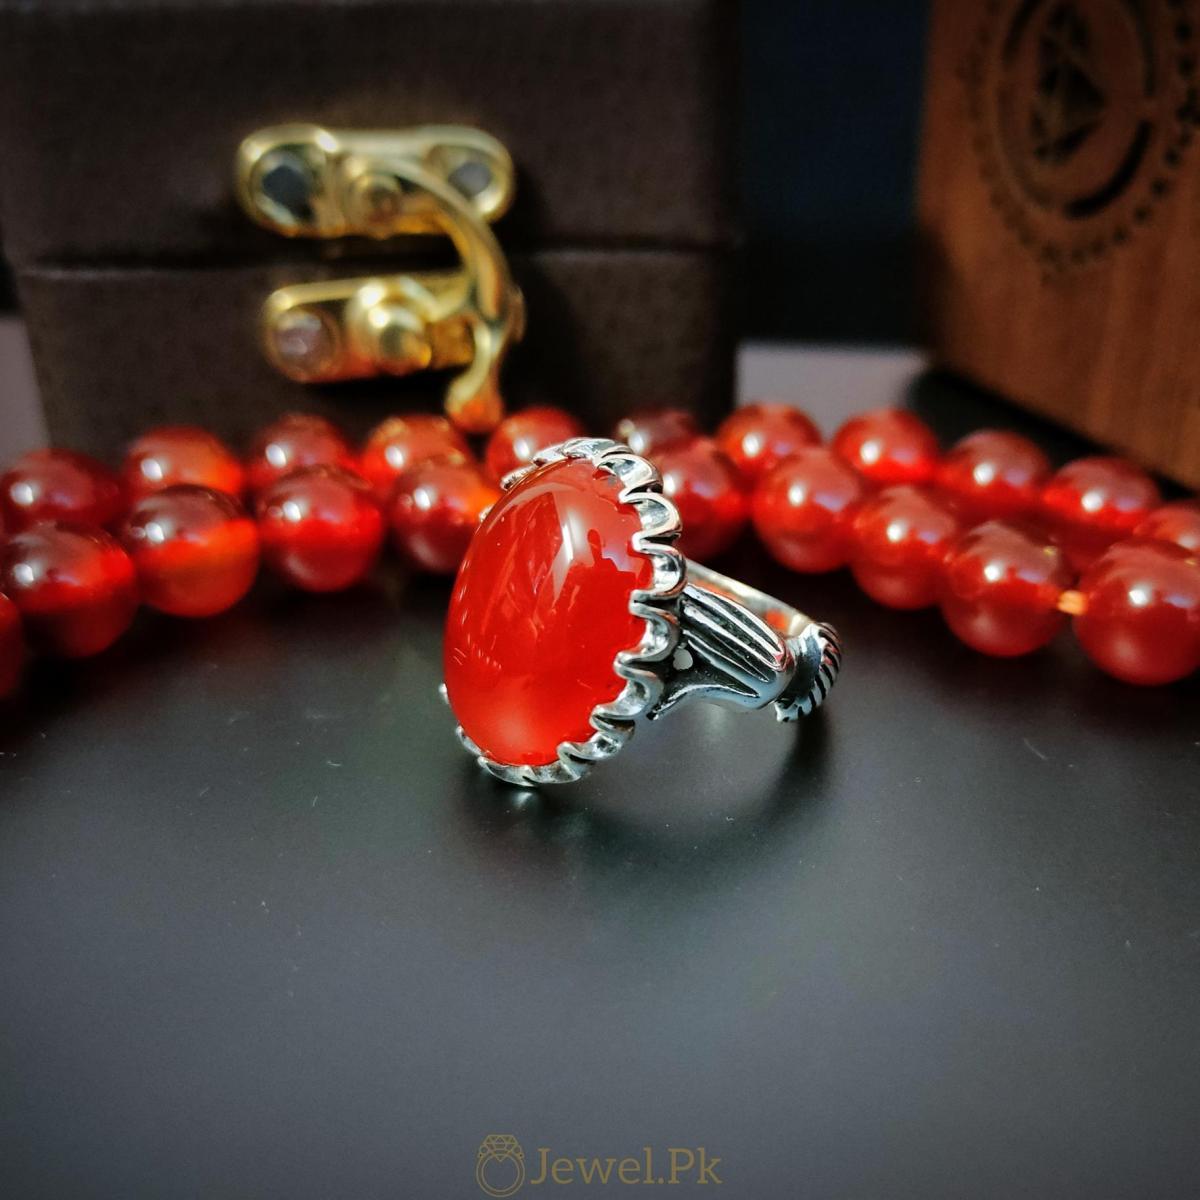 Beautiful Red Aqeeq Ring Yemeni Aqeeq Agate ring buy online 925 Silver Handmade Ring 5 natural gemstones pakistan + 925 silver jewelry online